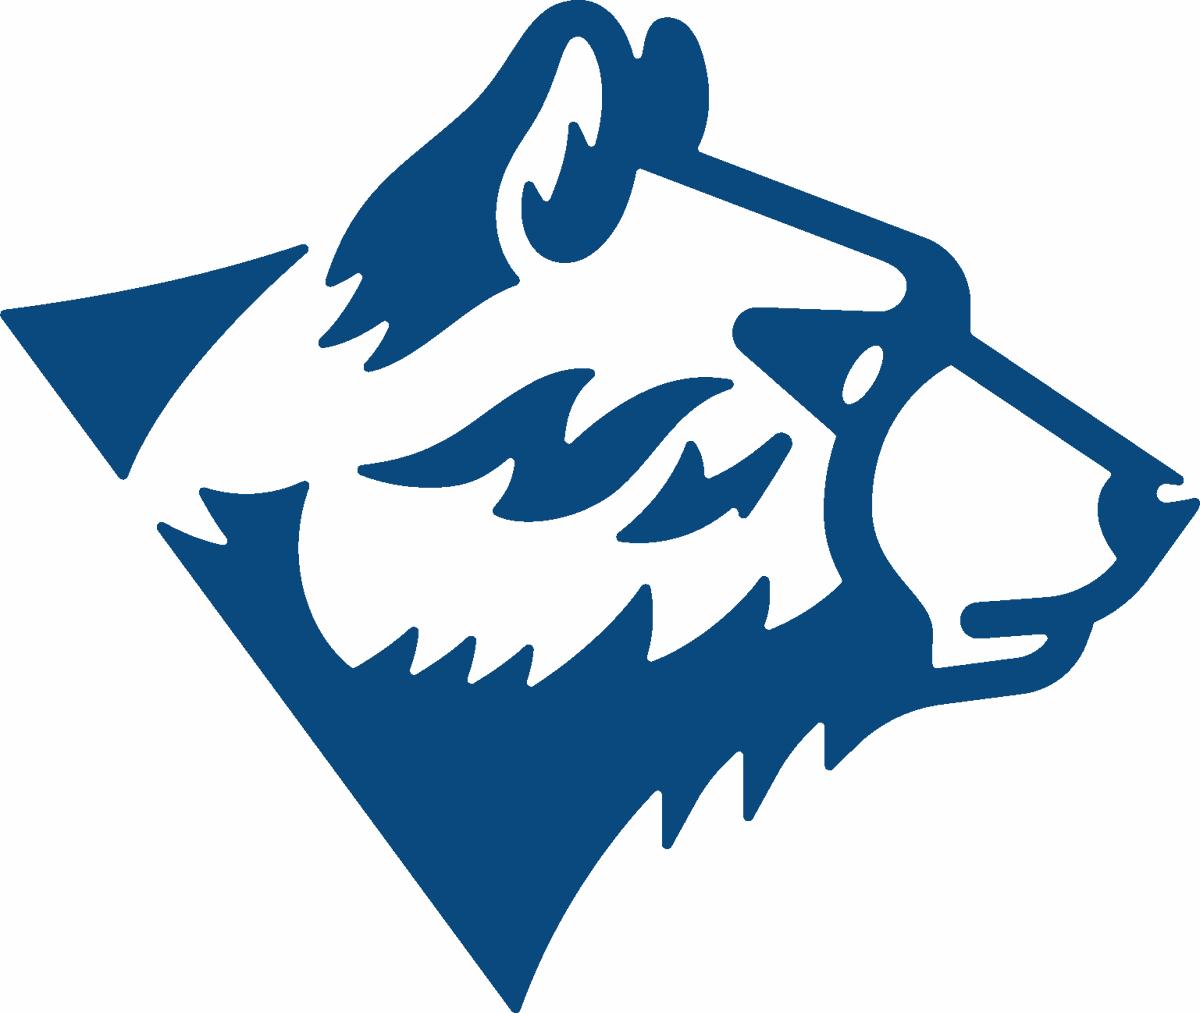 Blaze, the Northwood Technical College mascot